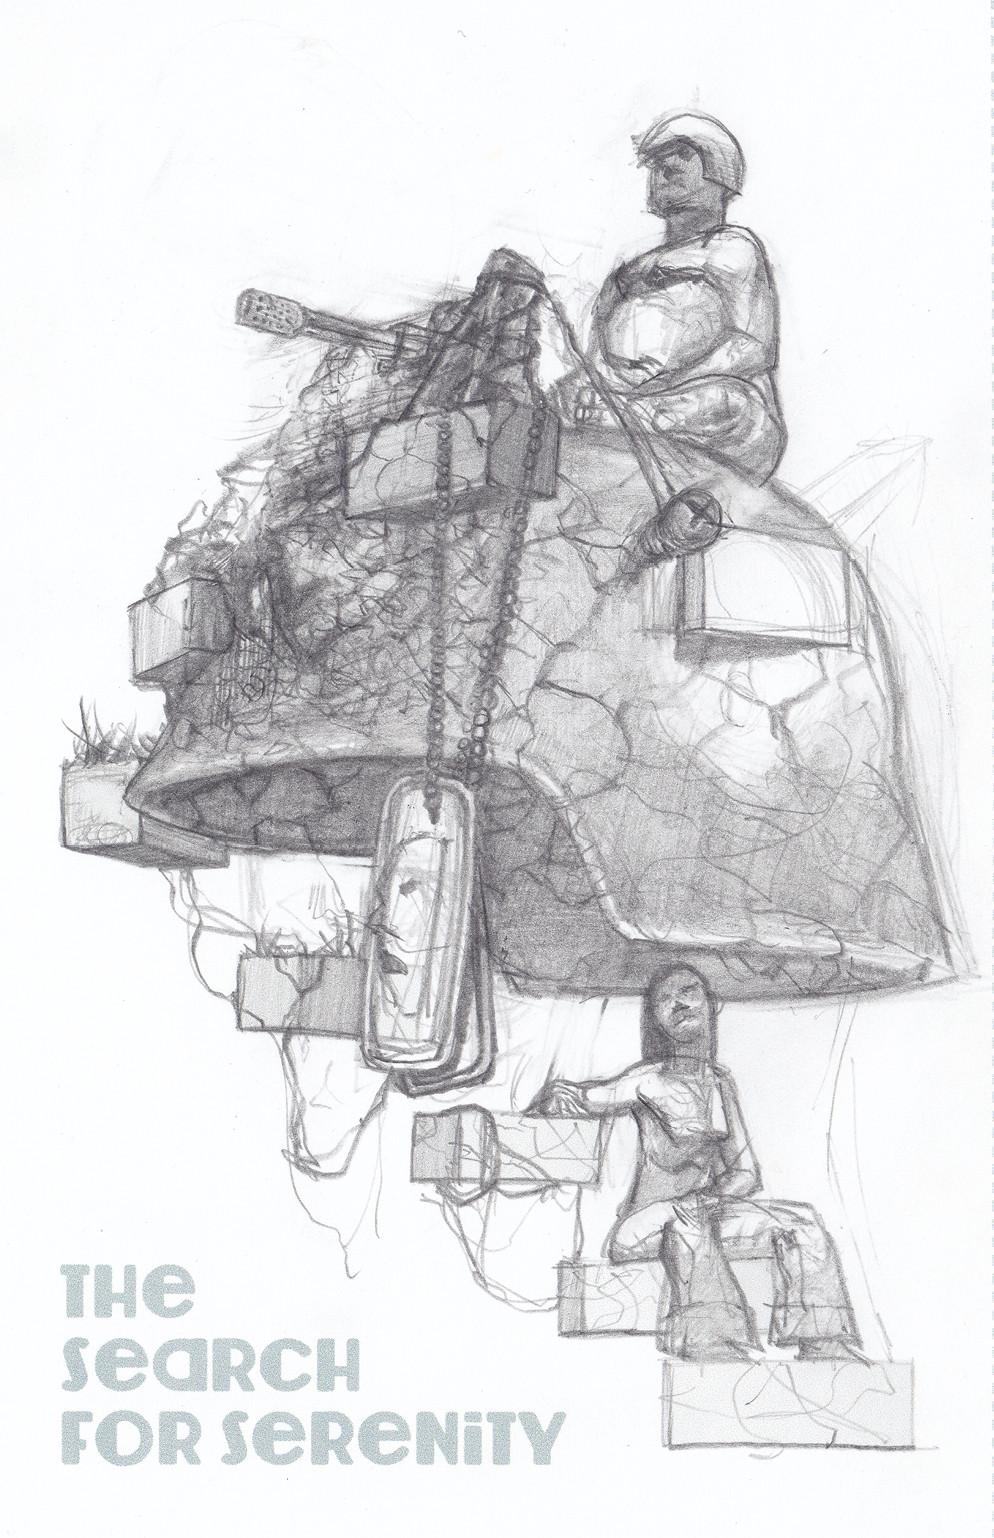 Sally Surreal $7 Sketch